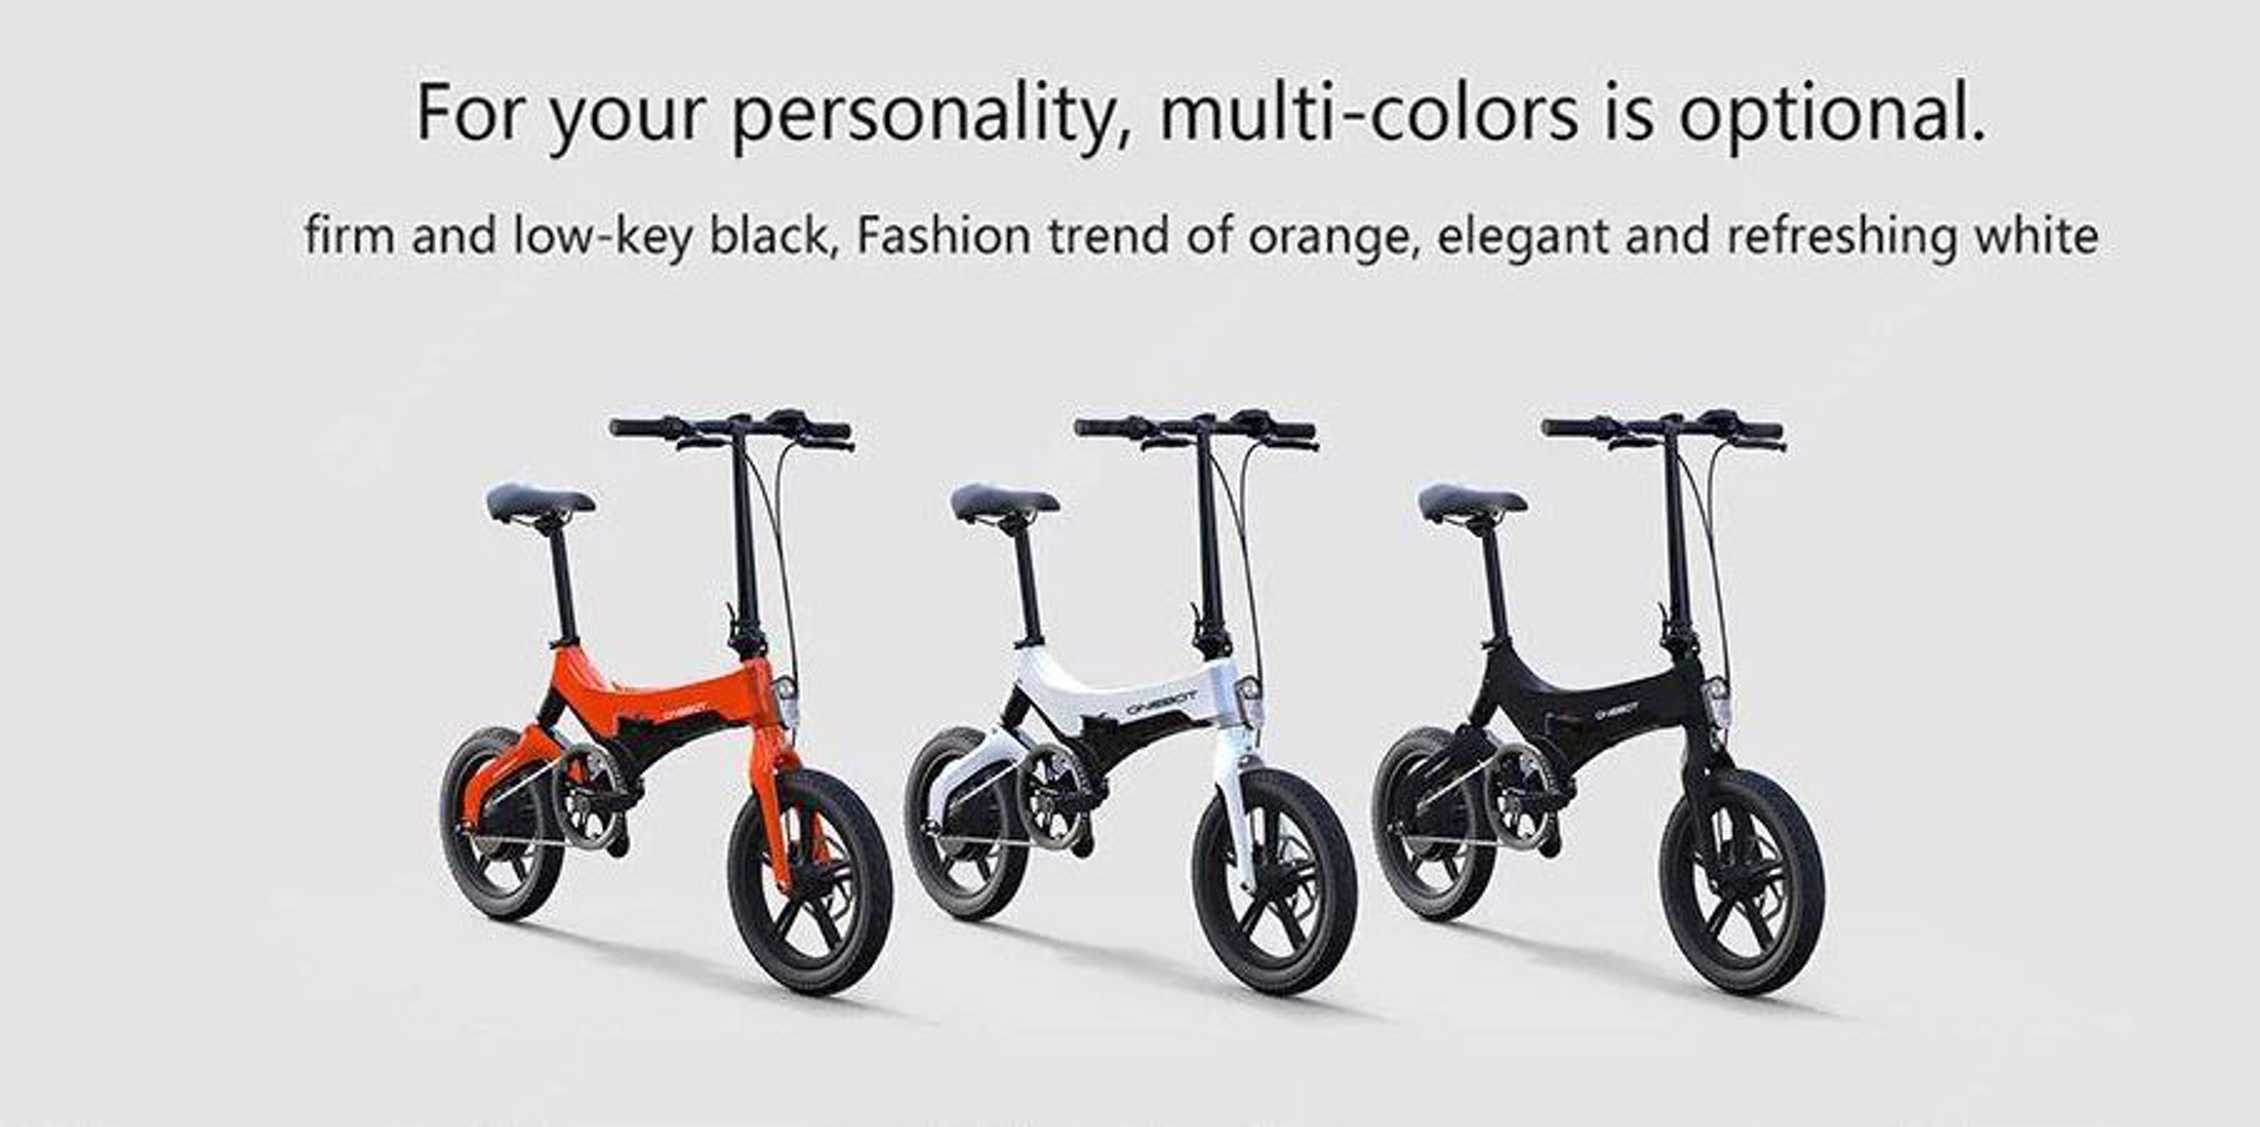 عرض الدراجة e onbot s6 gearbest